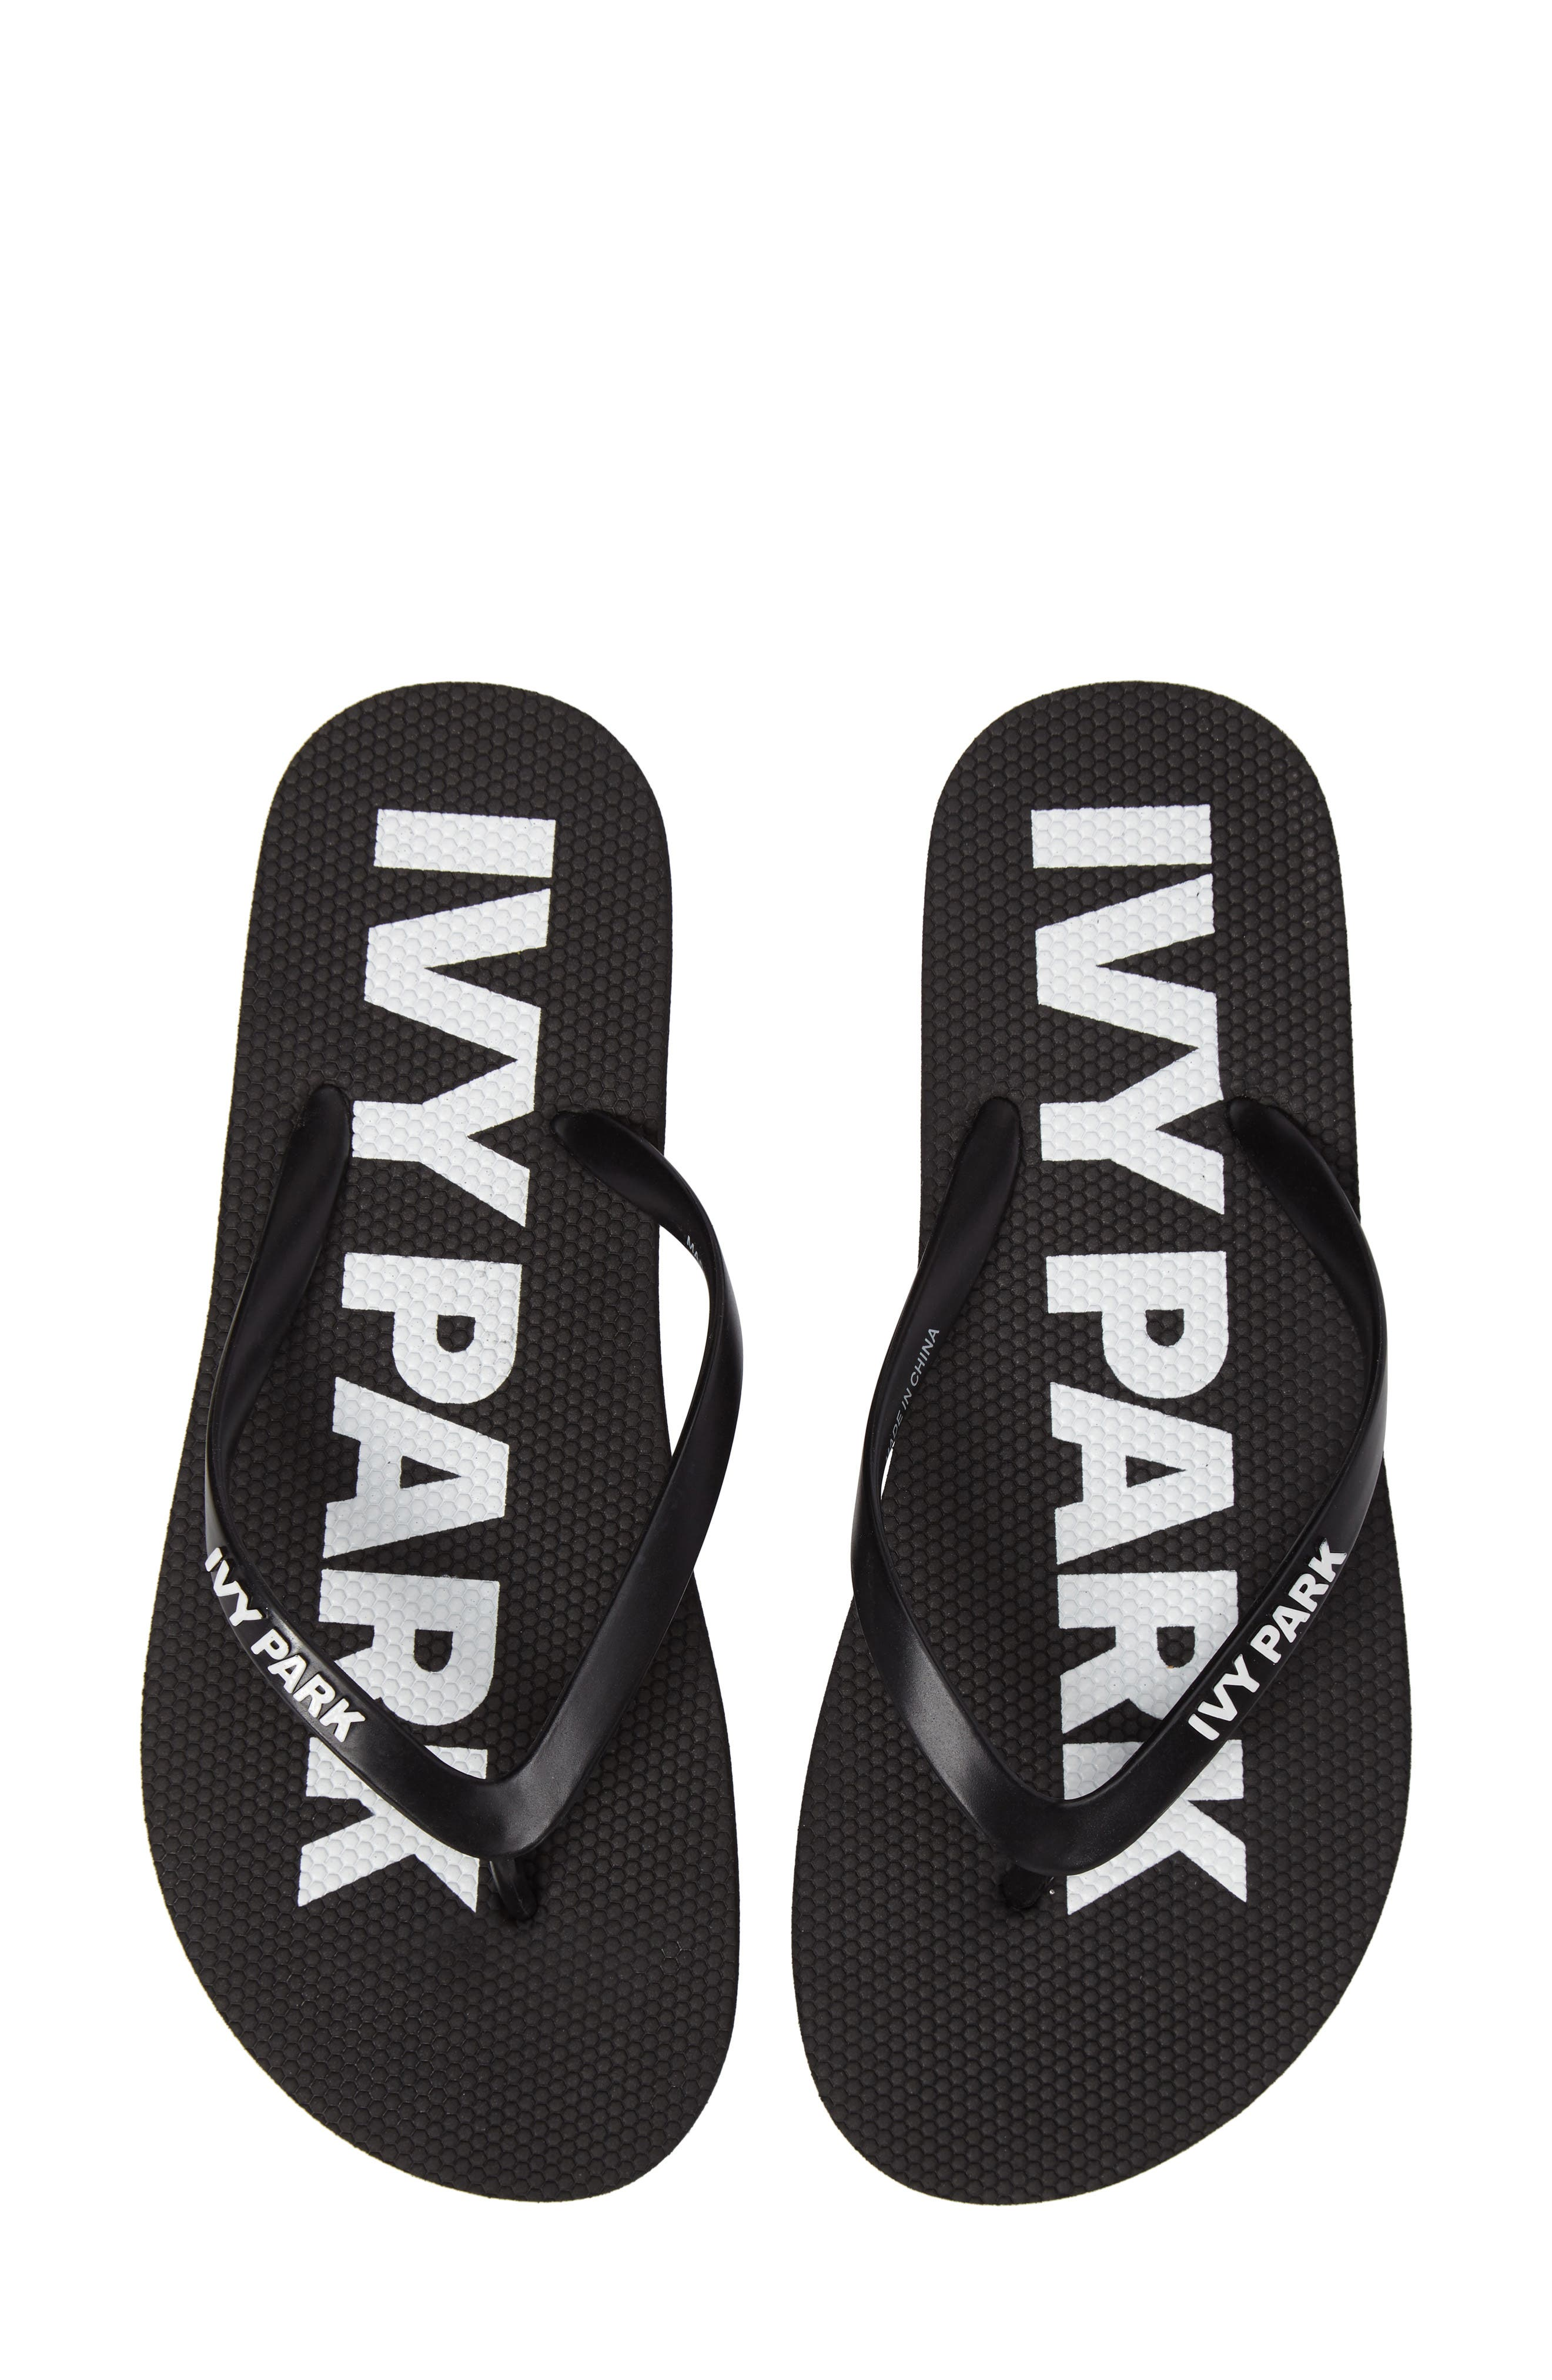 Main Image - IVY PARK® Logo Flip Flops (Women)